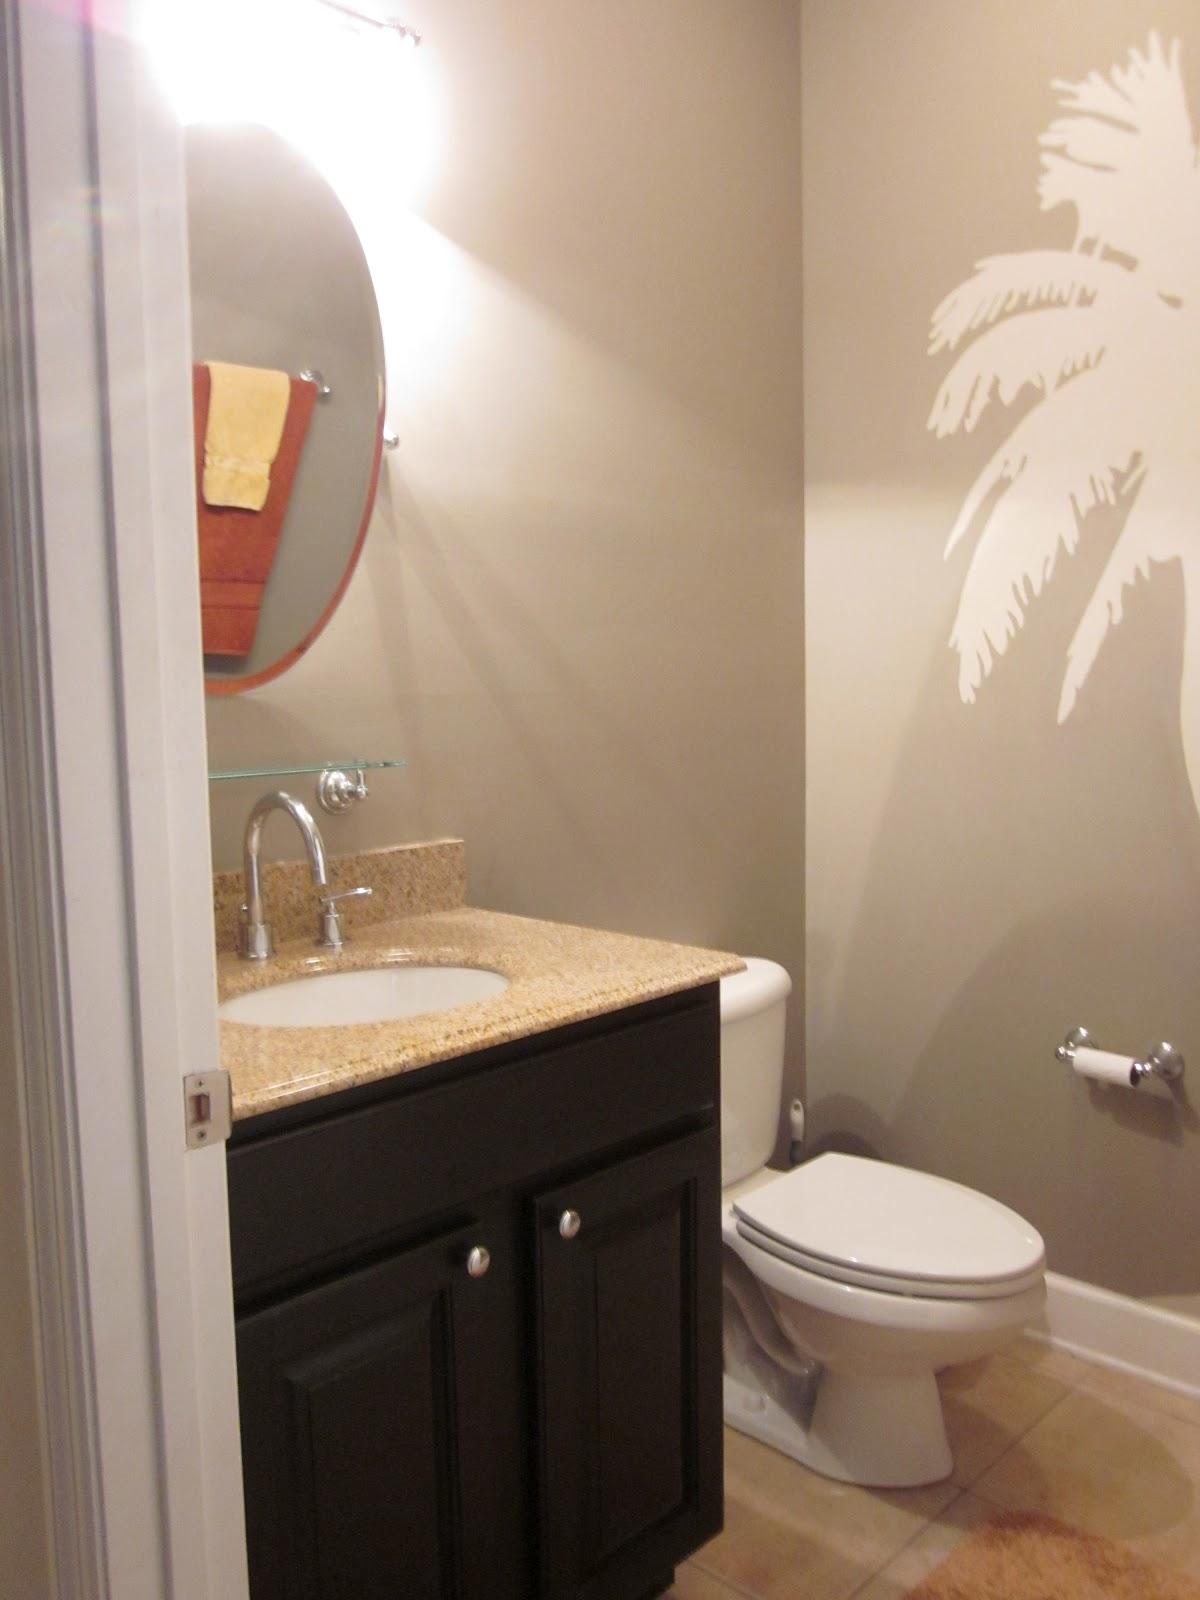 Palm Tree Bathroom Decor Ideas Bathroomist: Lipstick And A Brad Nailer ... Are The Only Essentials